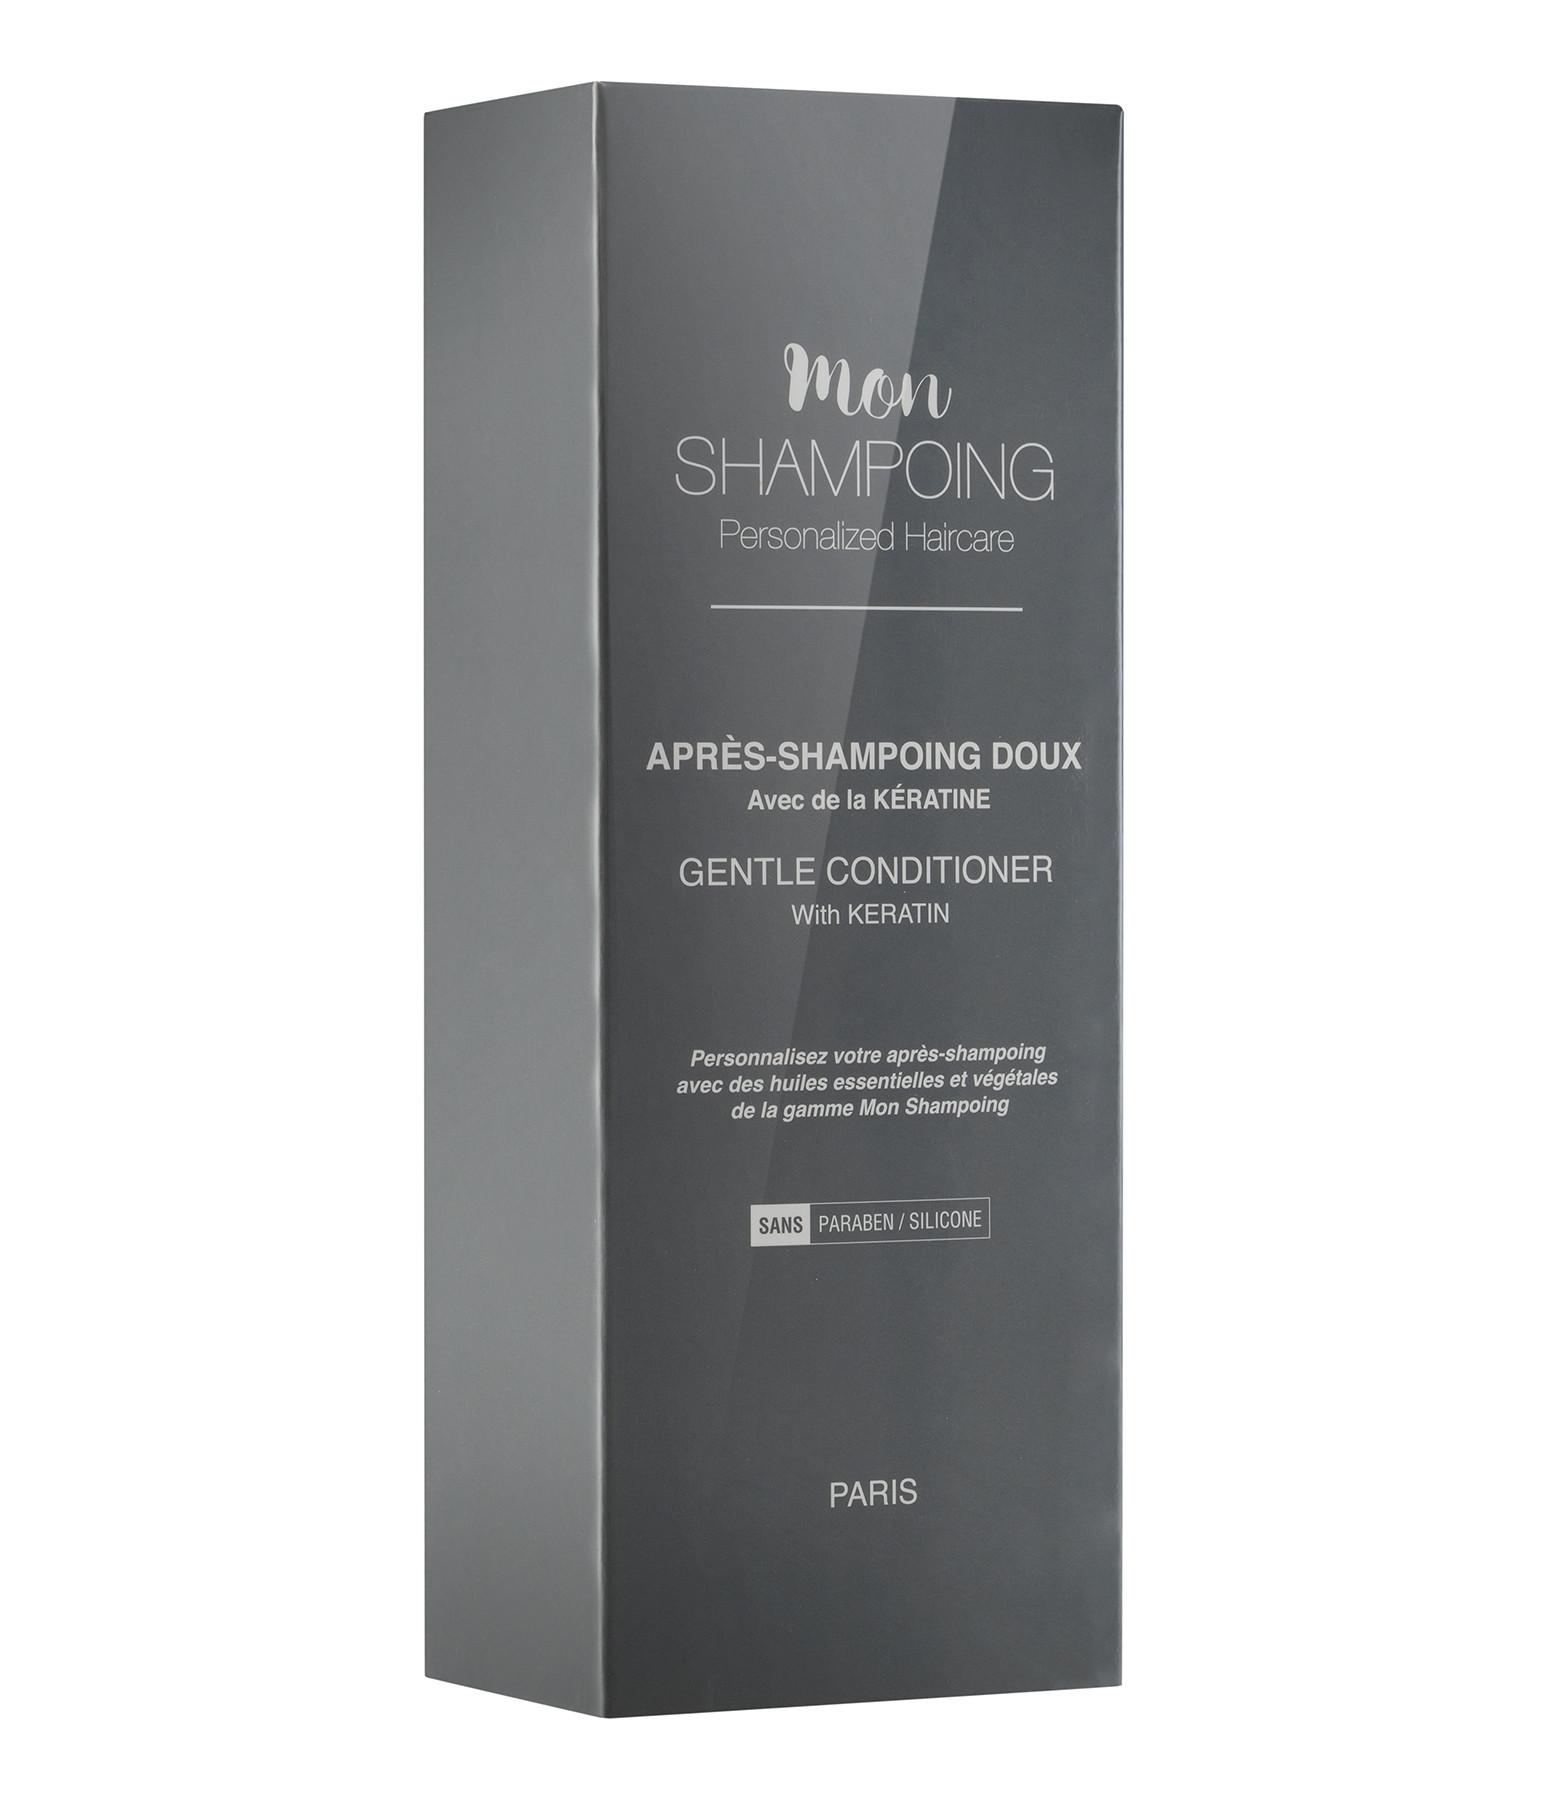 MON SHAMPOING - Après-Shampoing Naturel Neutre Keratine 250 ml